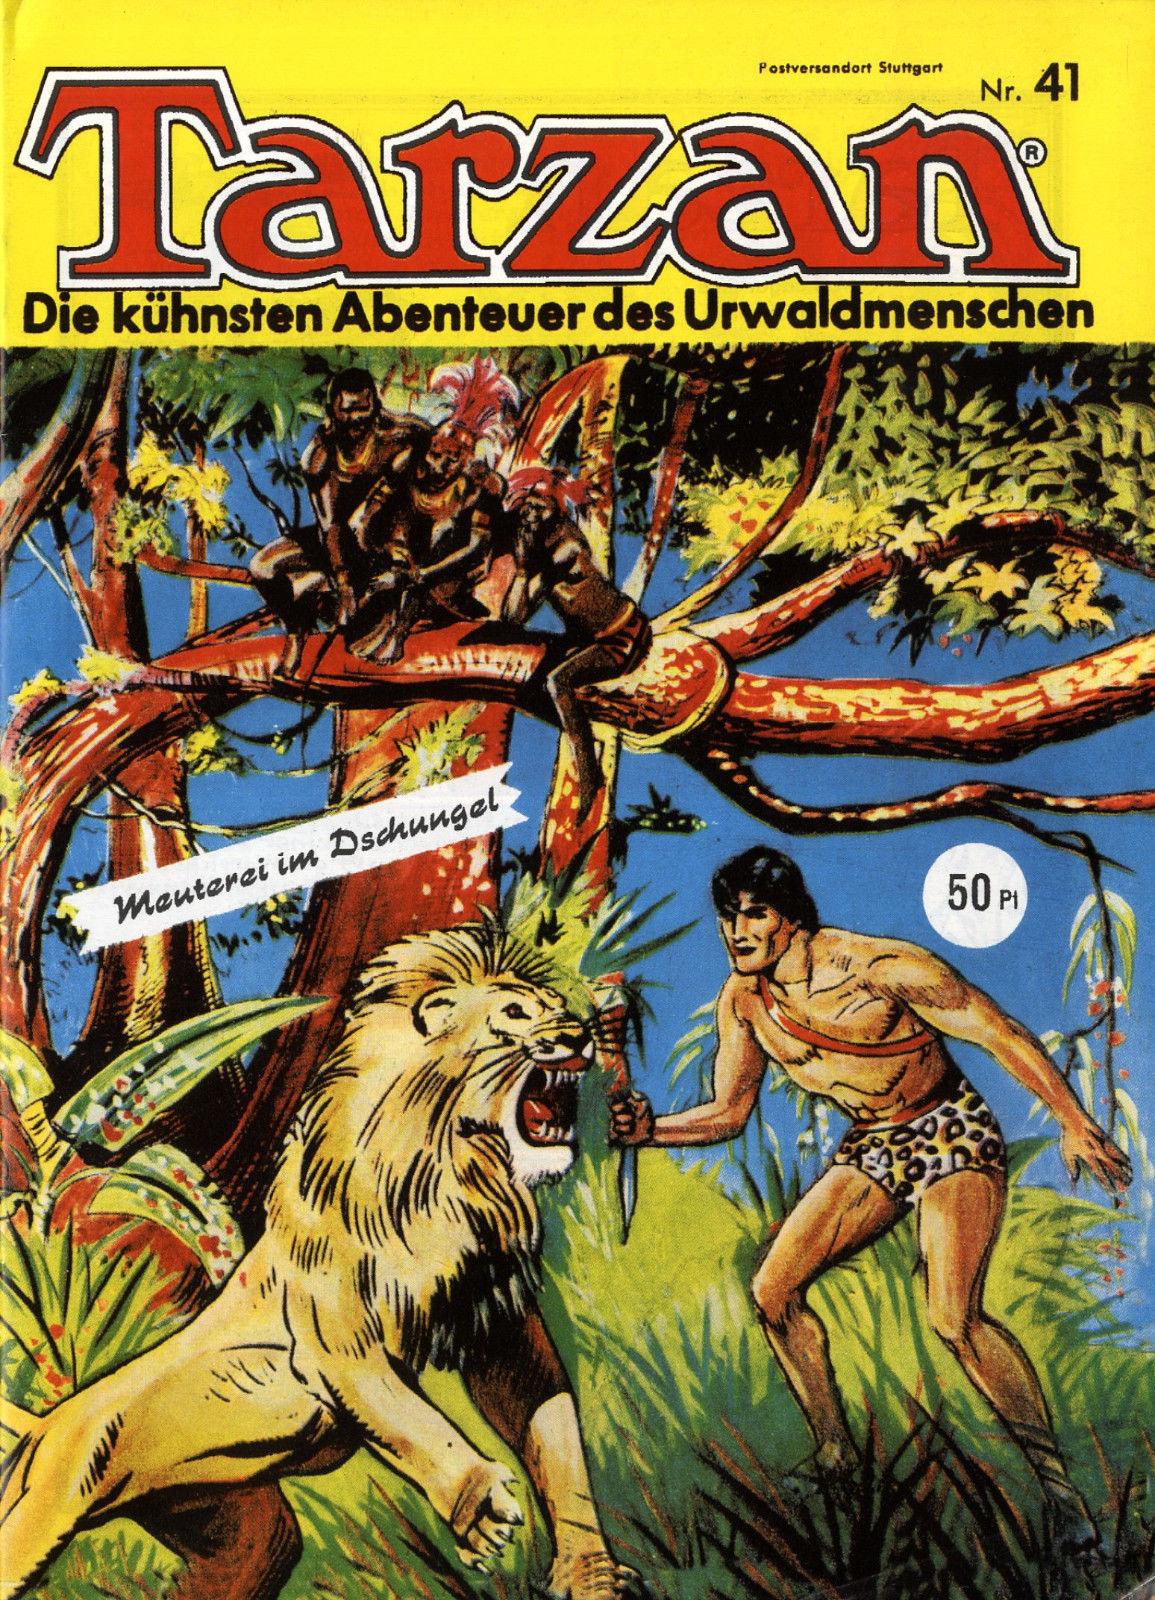 Tarzan Bewertung